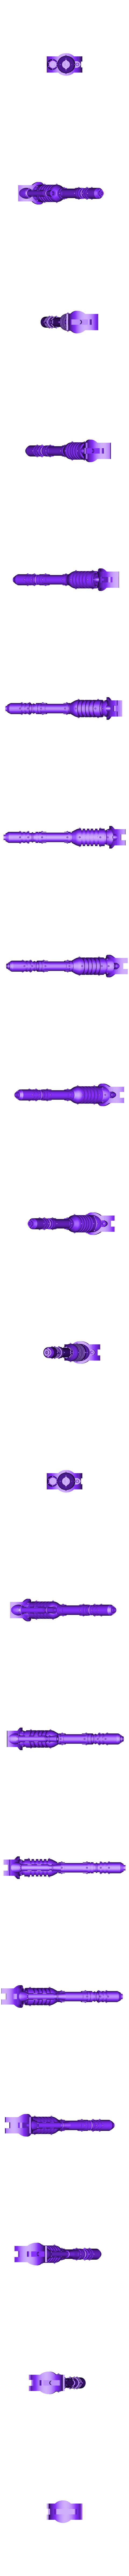 neutron_laser_smaller.stl Download free STL file Scuttling Spirit of the Machine God • 3D printer model, FelixTheCrazy